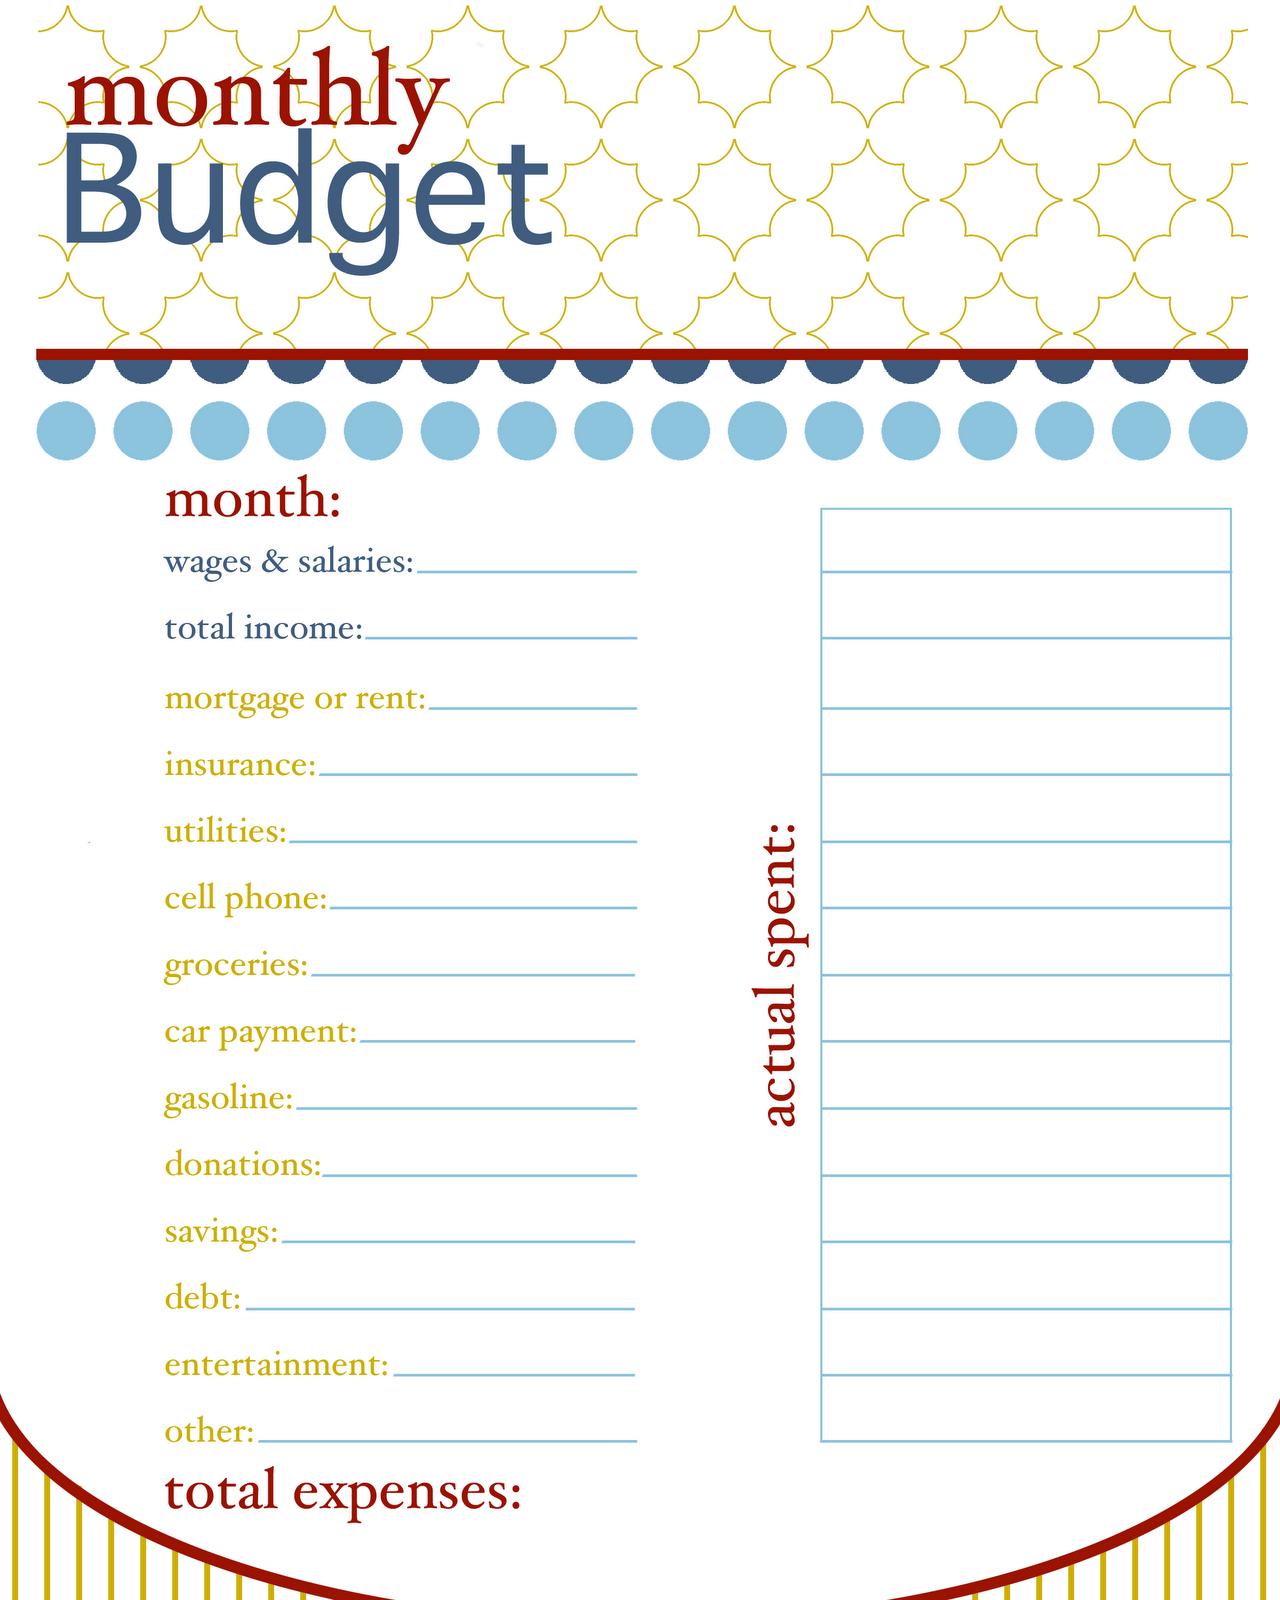 Free Worksheet Free Printable Budget Worksheets 17 best images about printables on pinterest printable budget sheets alphabet worksheets and binder